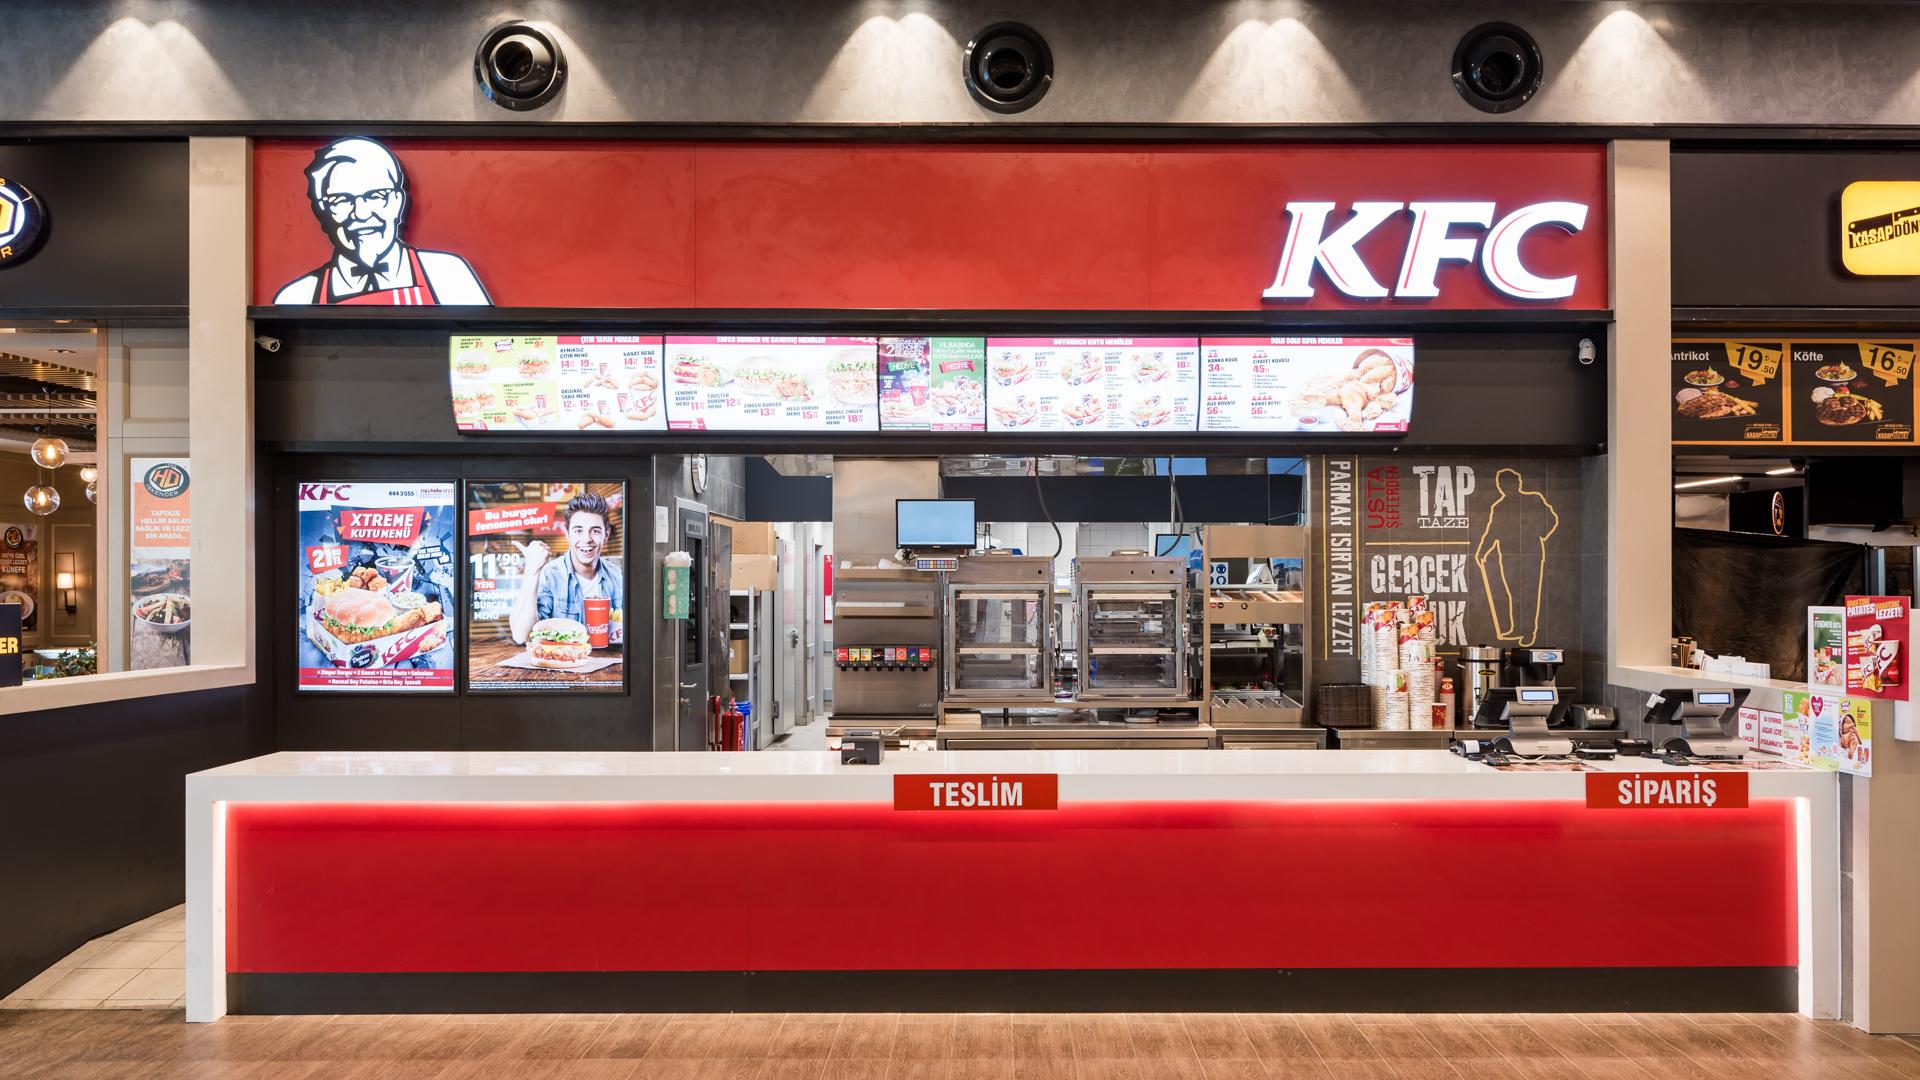 KFC Restoran Fotoğraf Çekimi